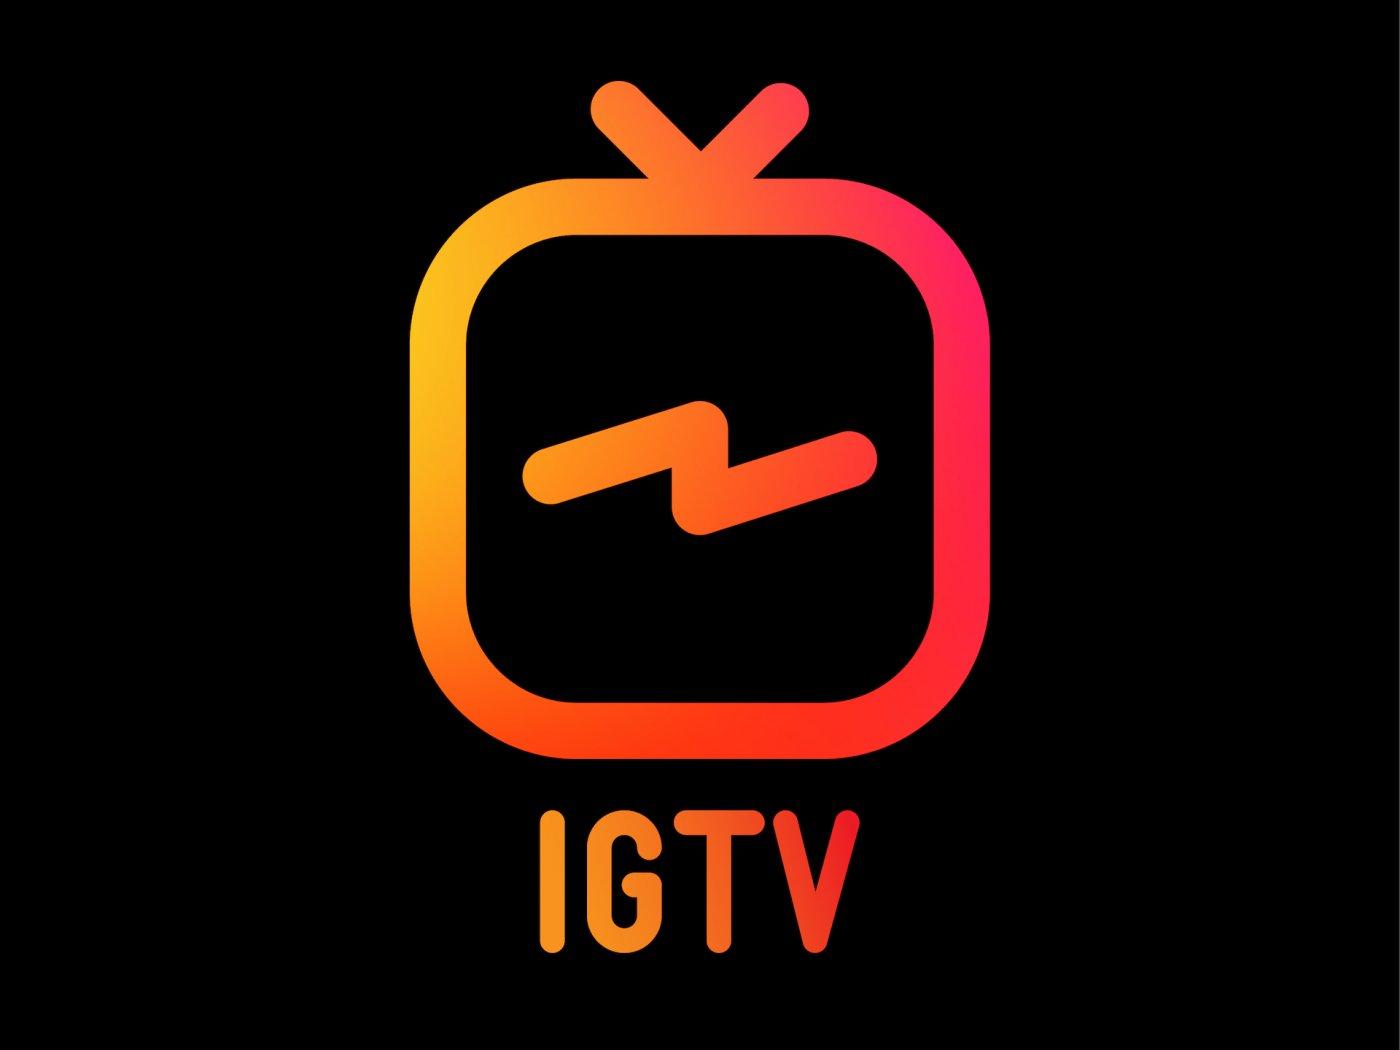 igtv-vector-gradient-logo